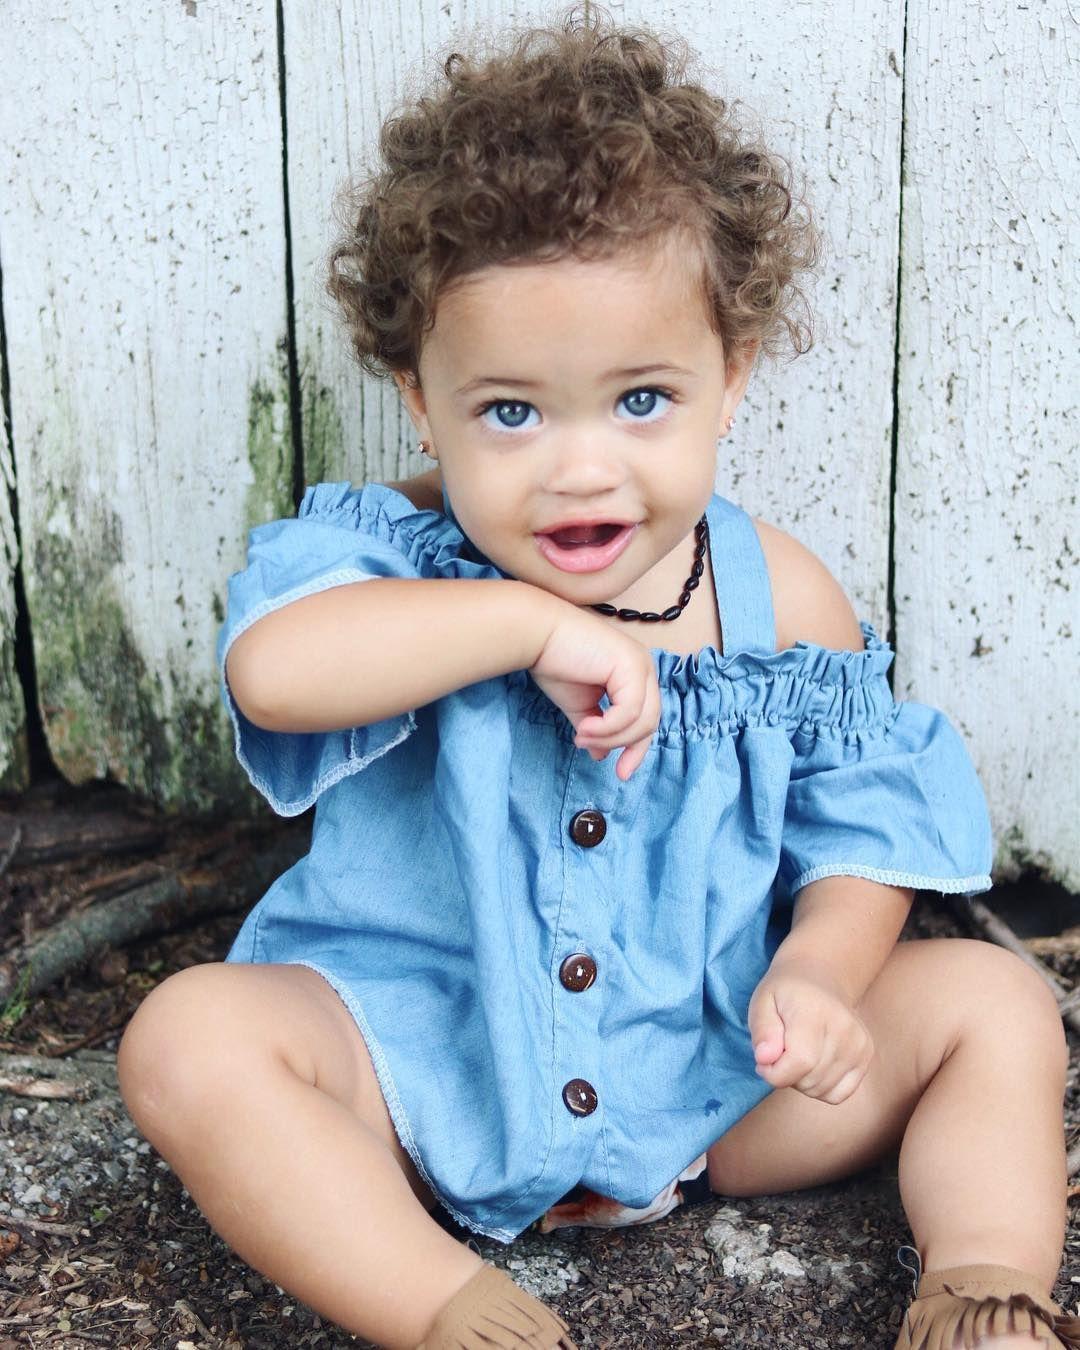 Baby Girl Clothing° Greyson Regina Land @greyson_land via Instagram ...